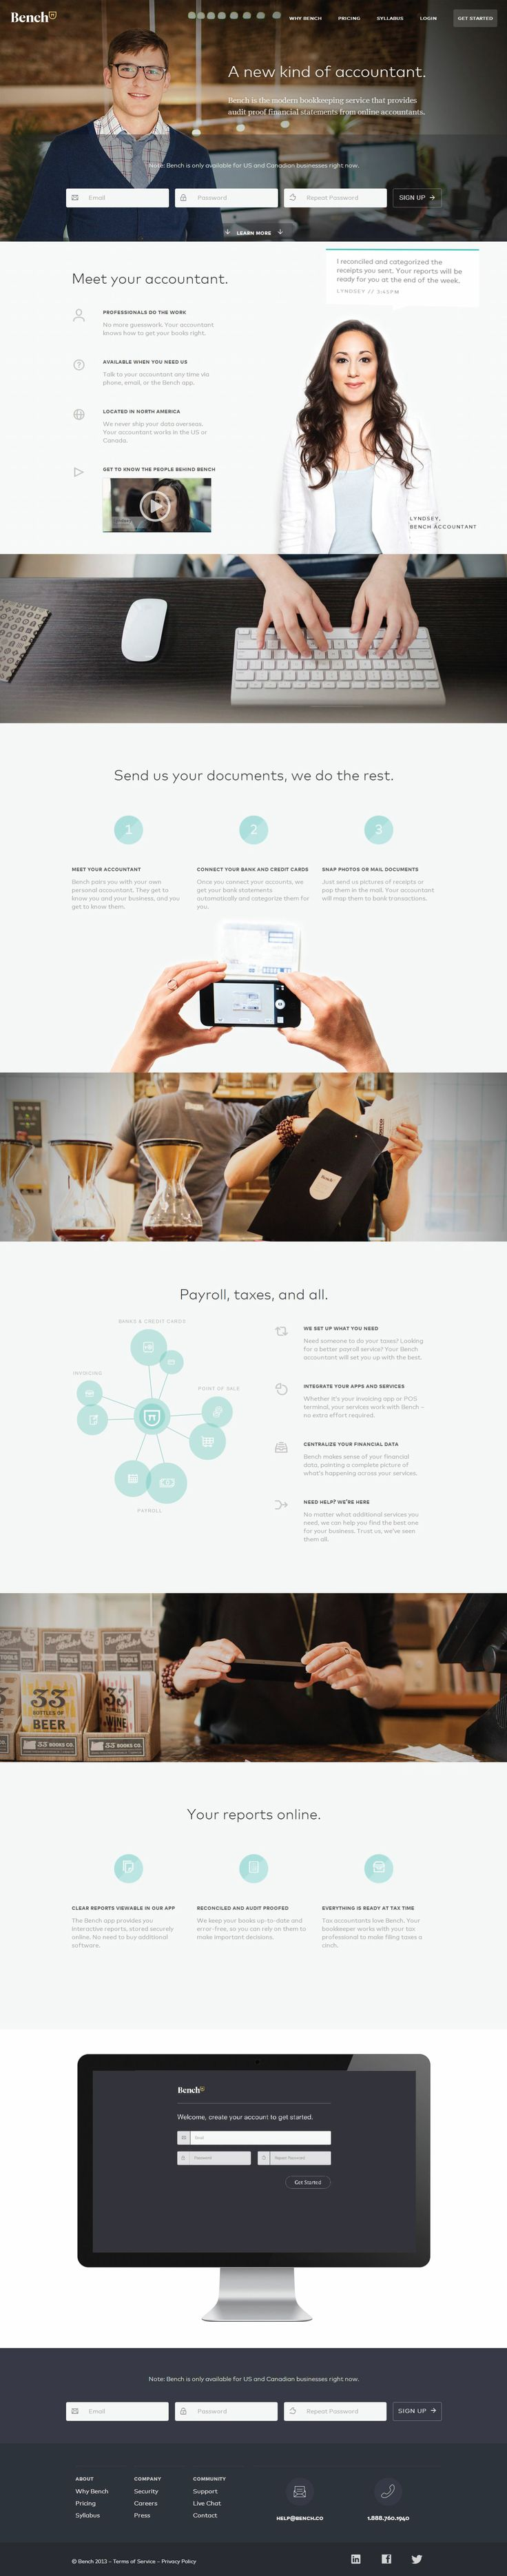 Bench - Flat UI Design Website